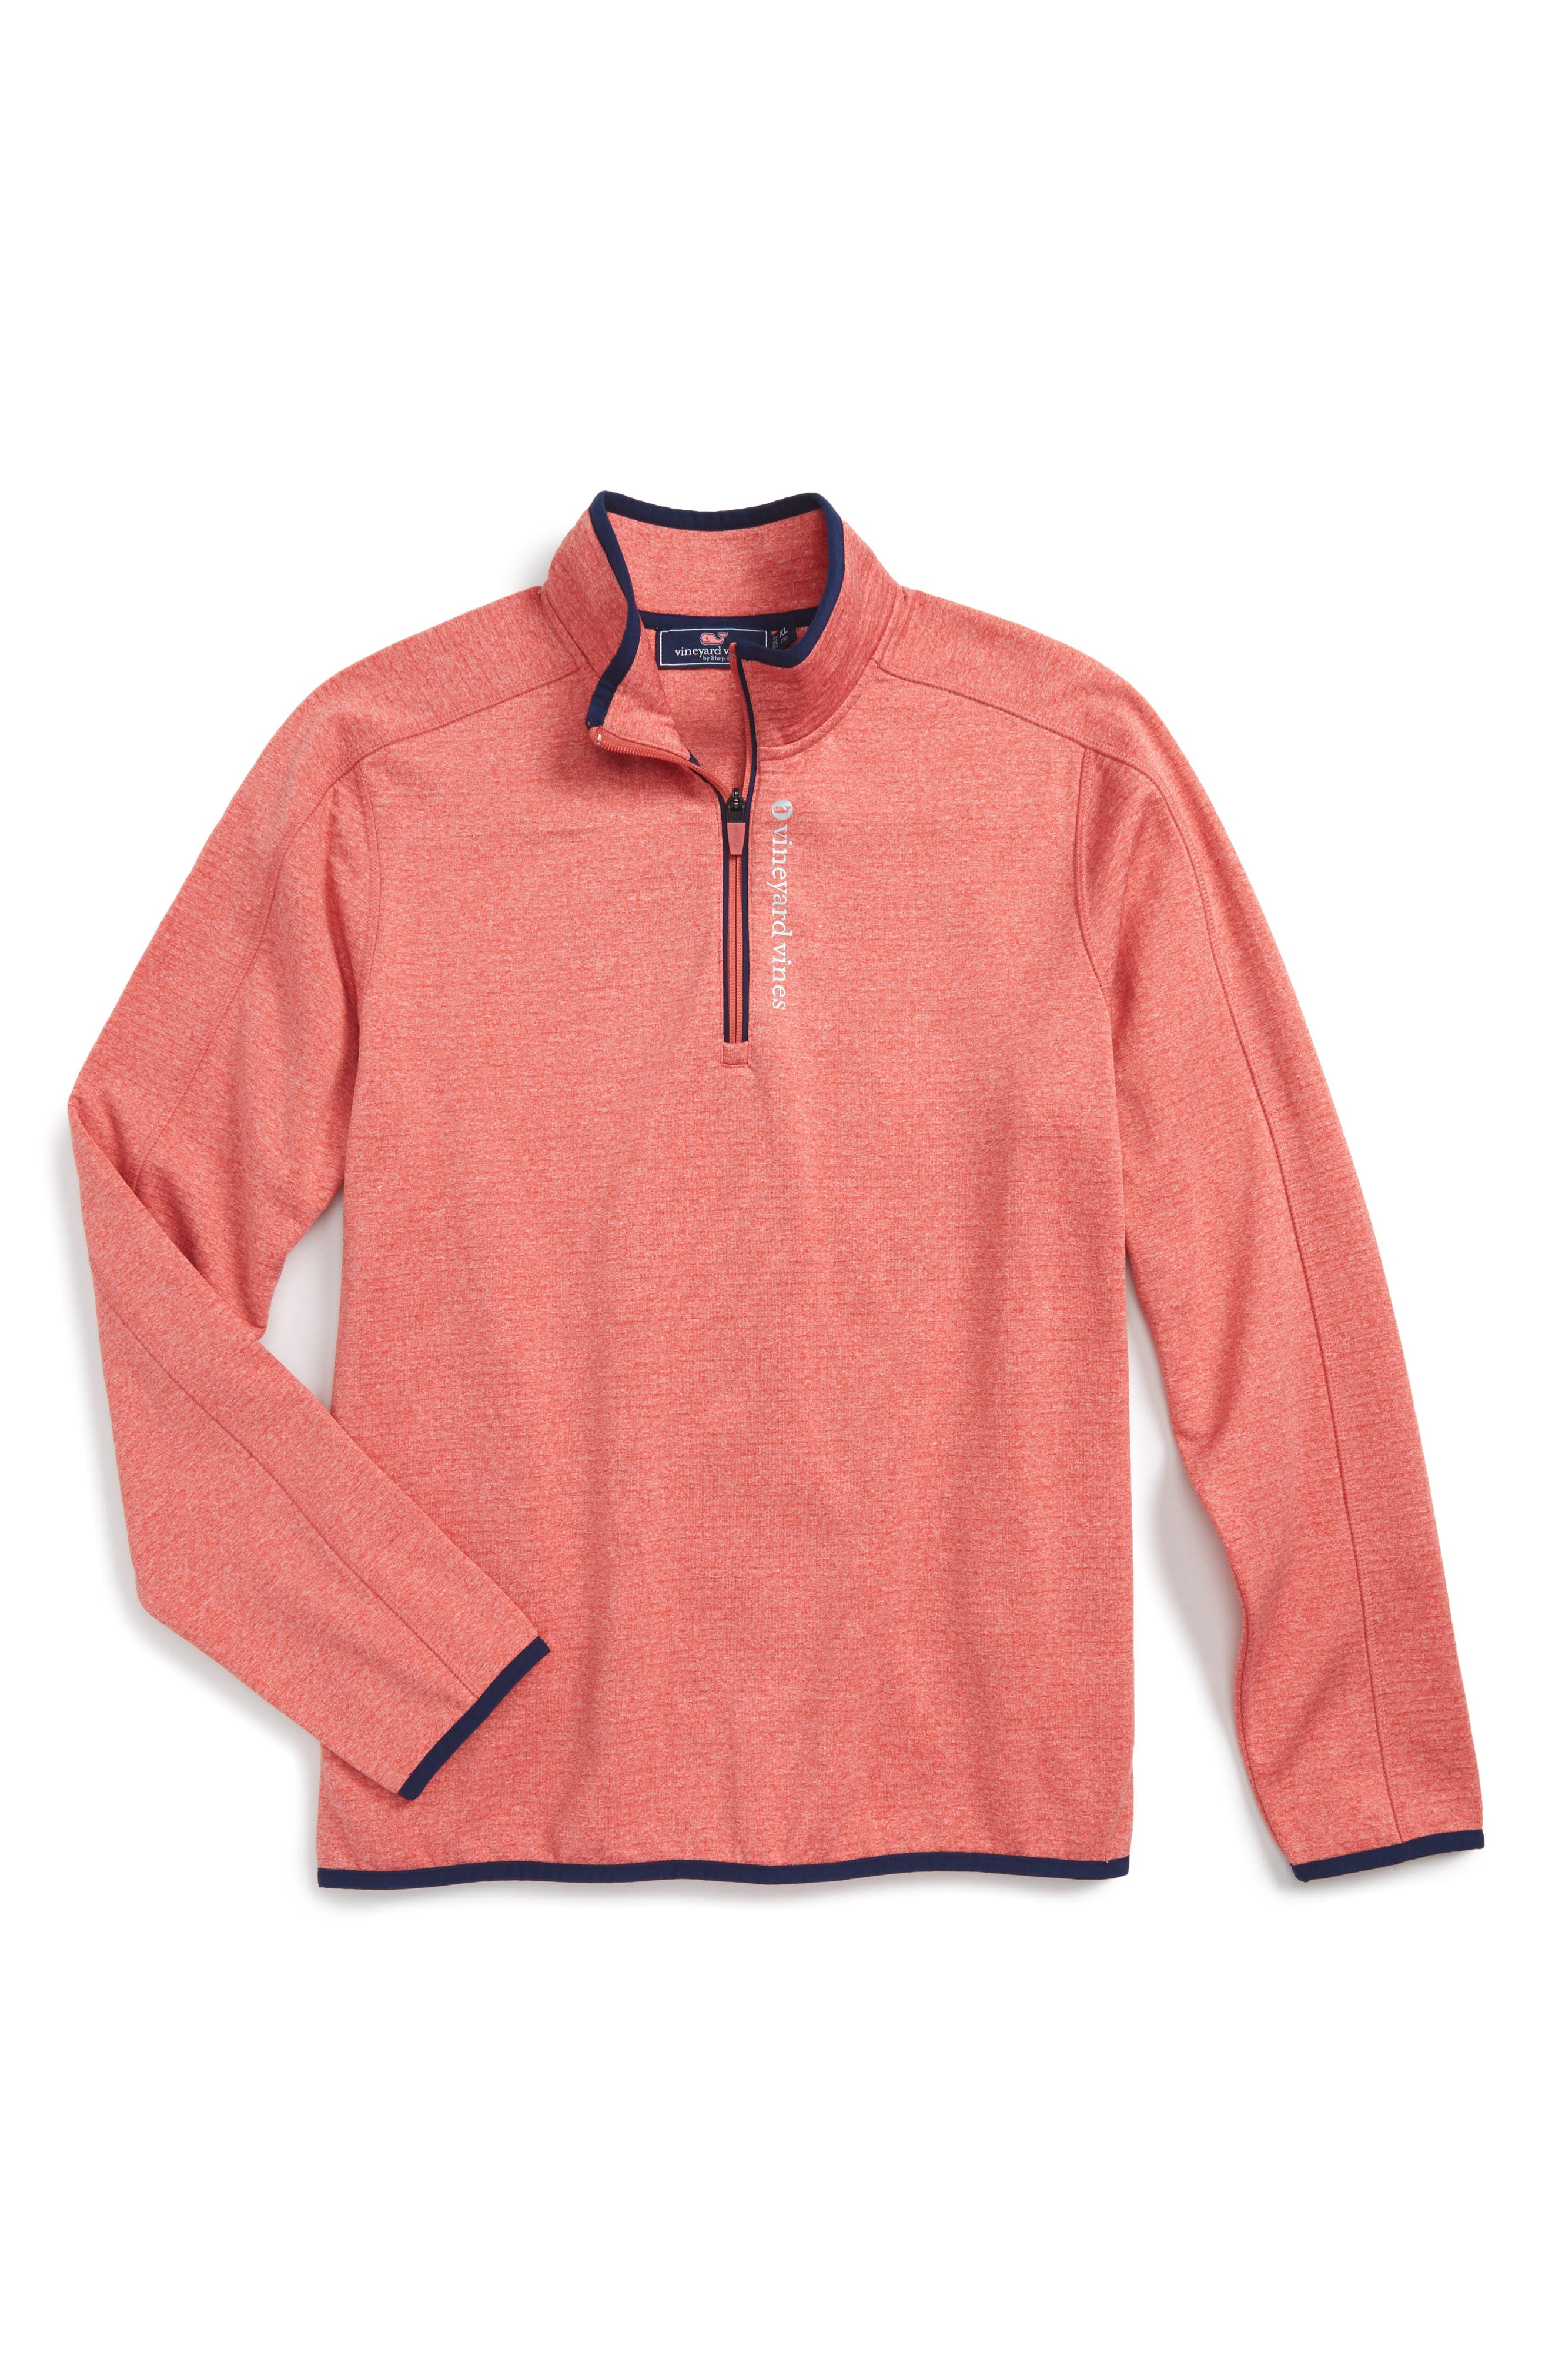 VINEYARD VINES Grid Fleece Sweater